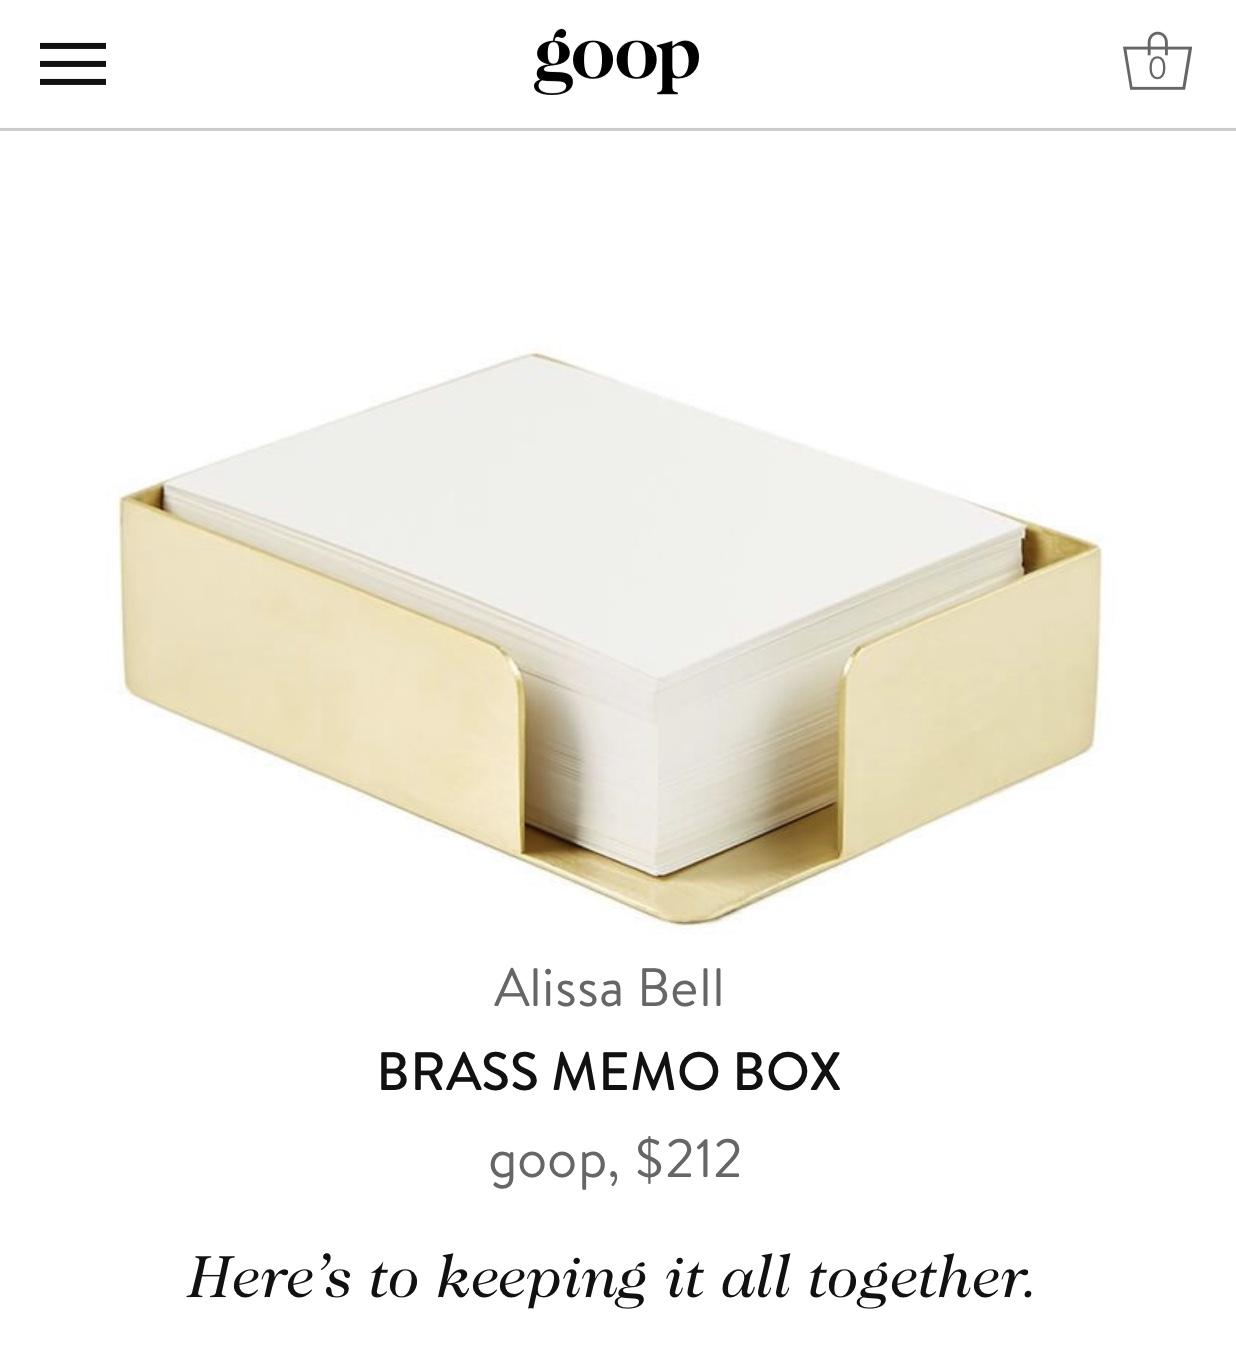 Alissa Bell Brass Memo Box Goop